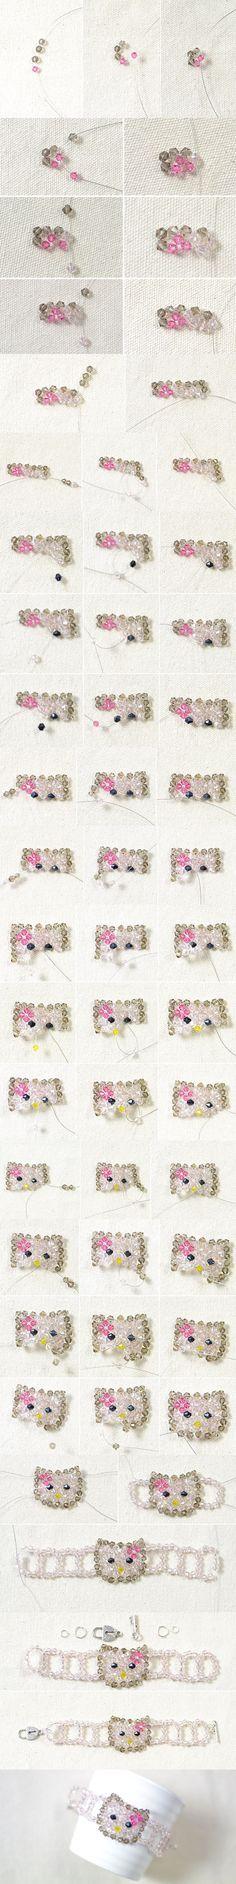 Tutorial on How to Make a Hello Kitty Charm Bead Bracelet for Kids from LC.Pandahall.com                        #pandahall